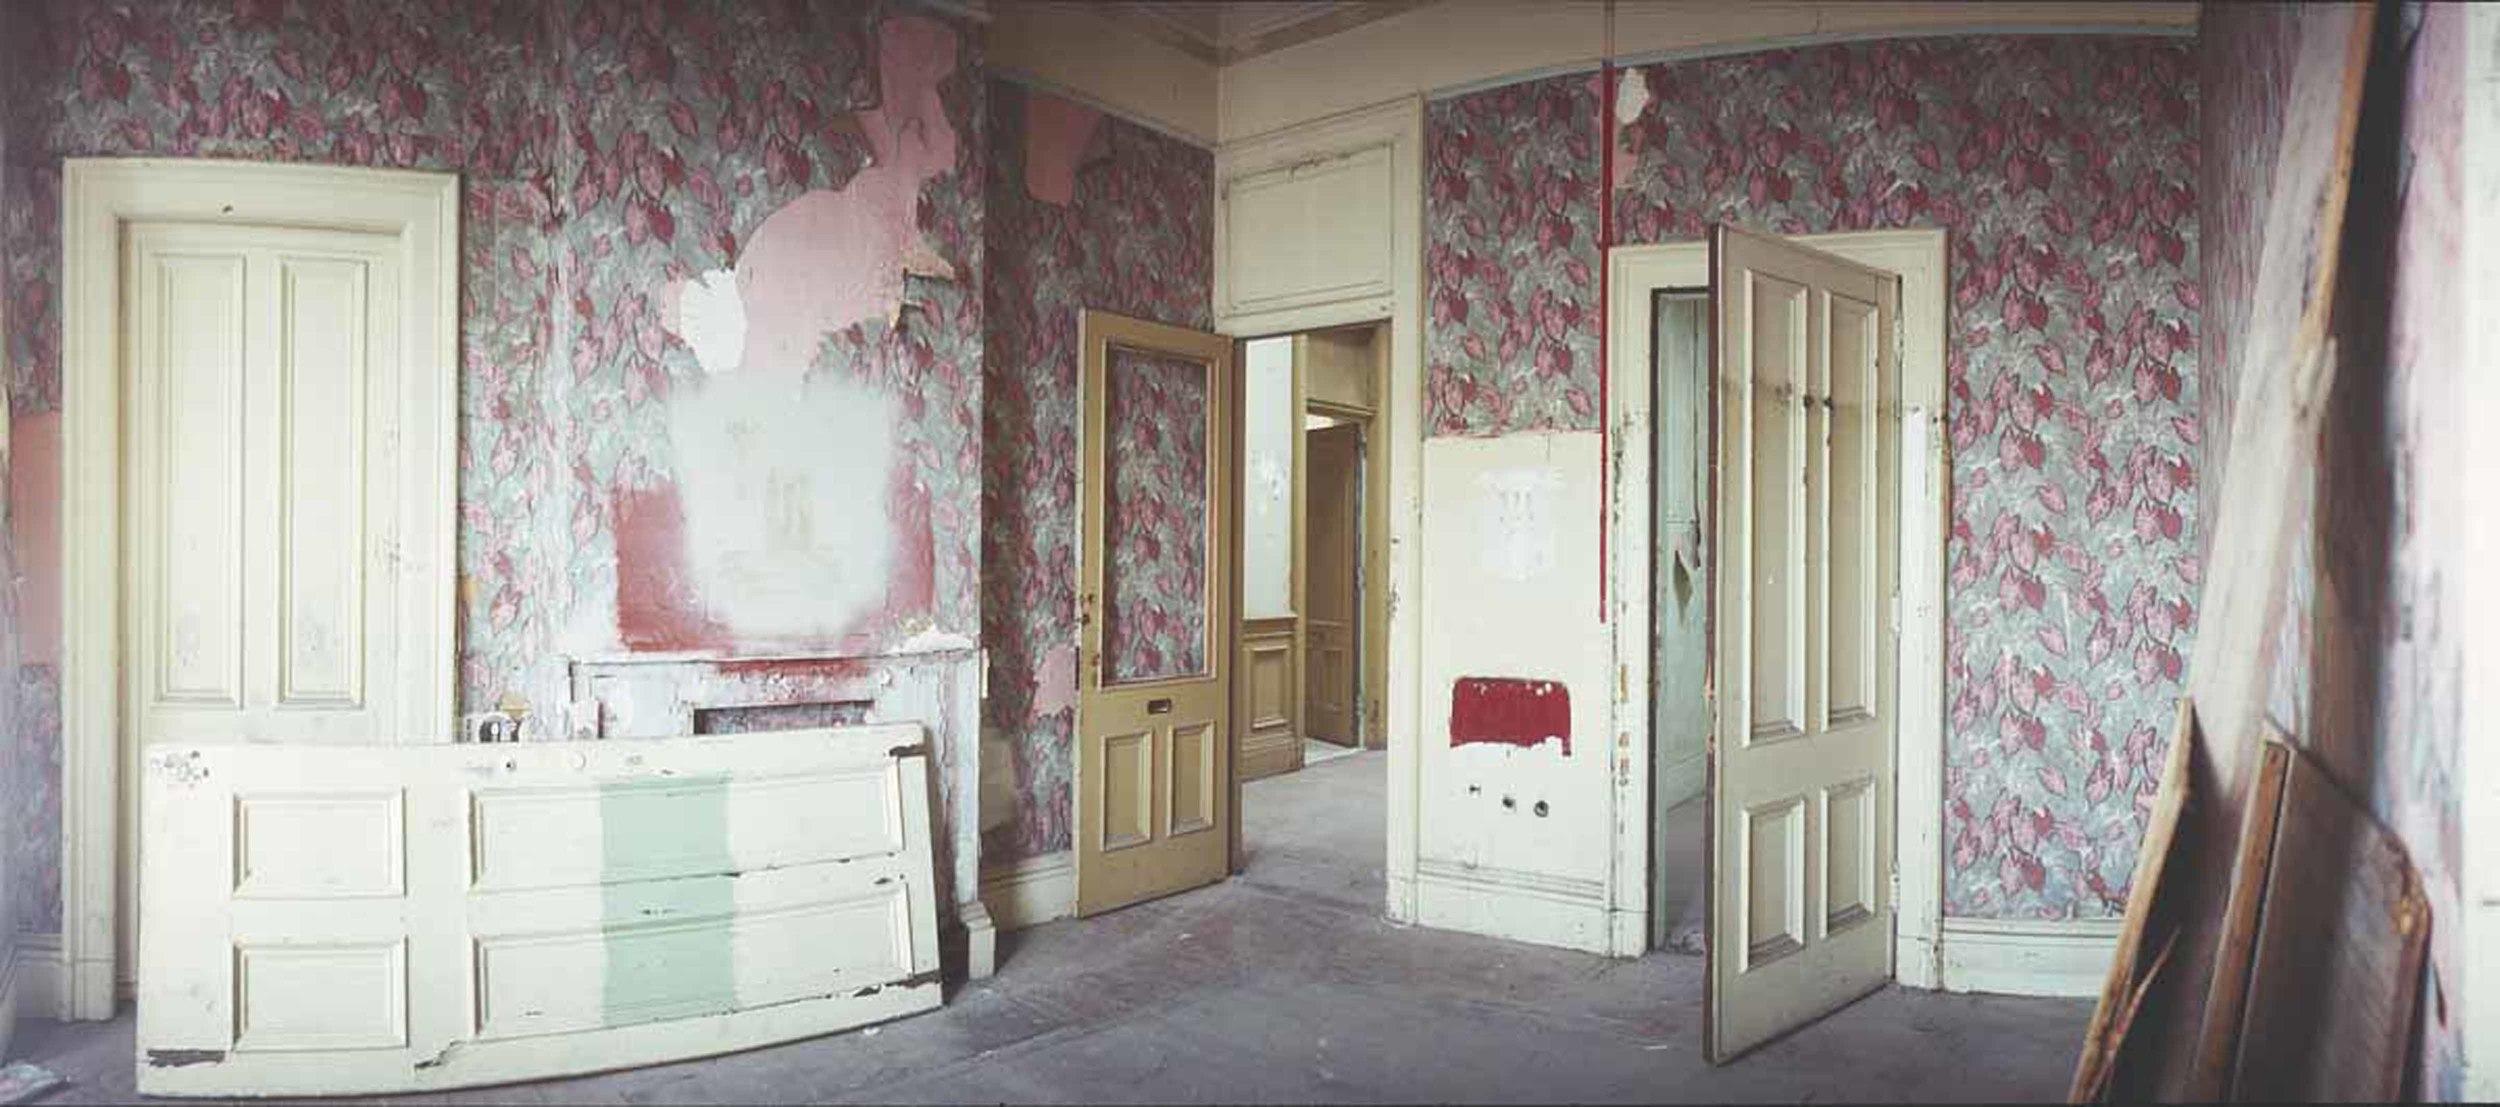 Interior, Oakland, 1987